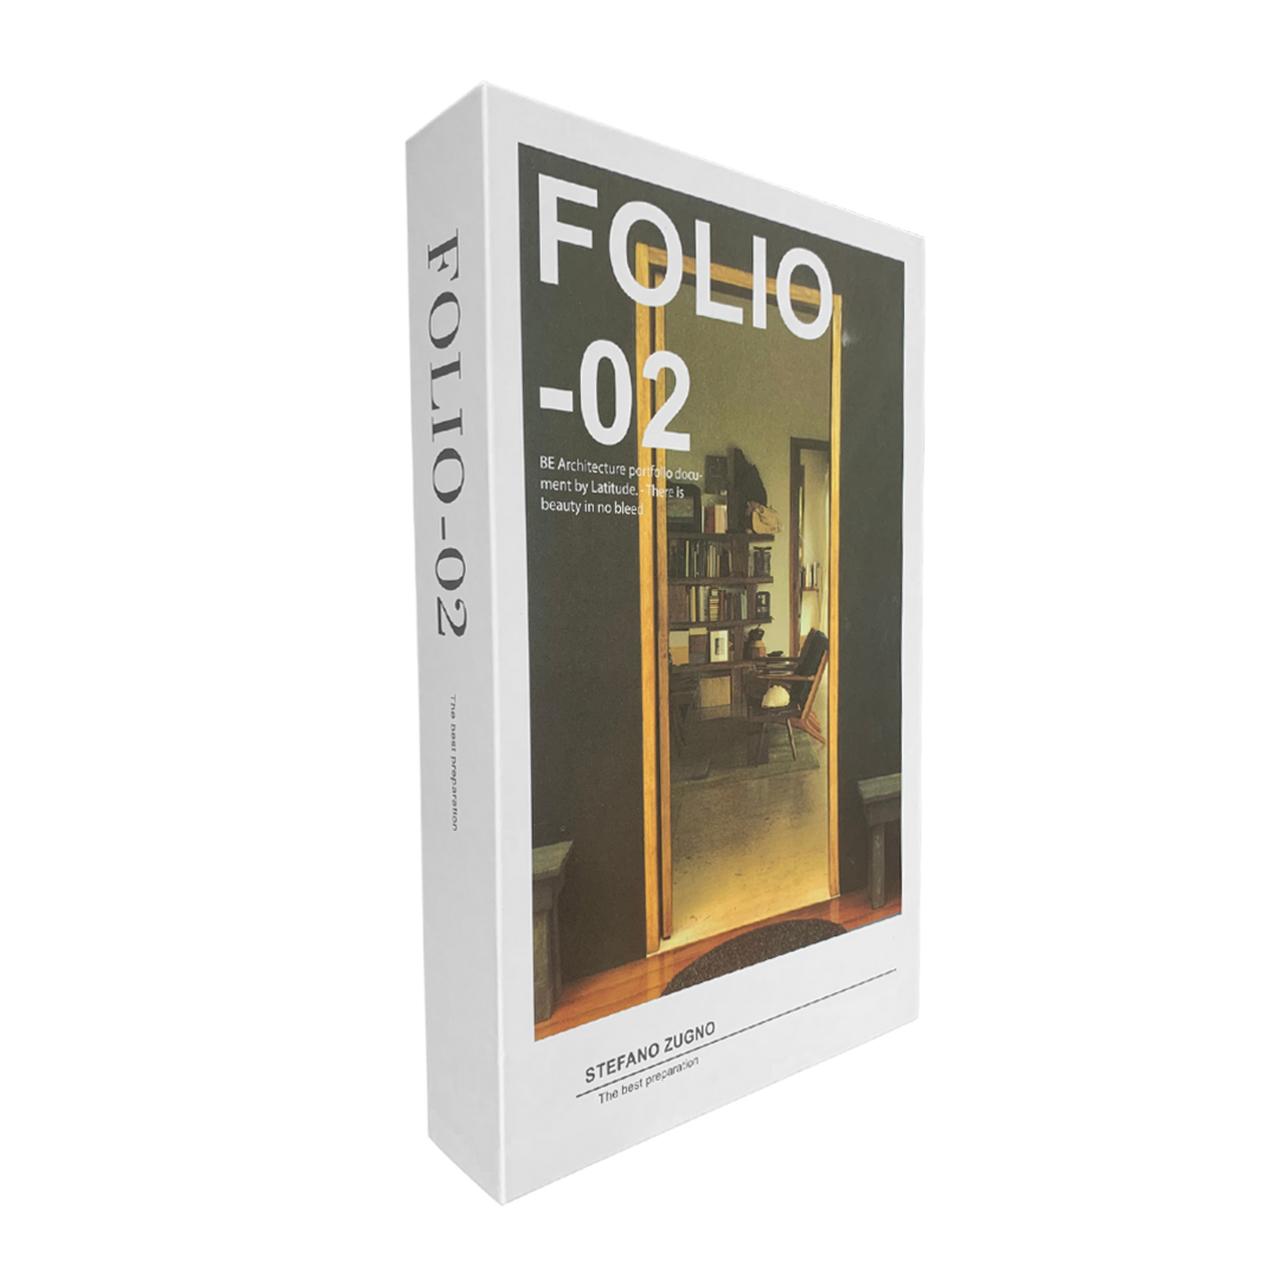 Caixa Livro Decorativa Folio - 02